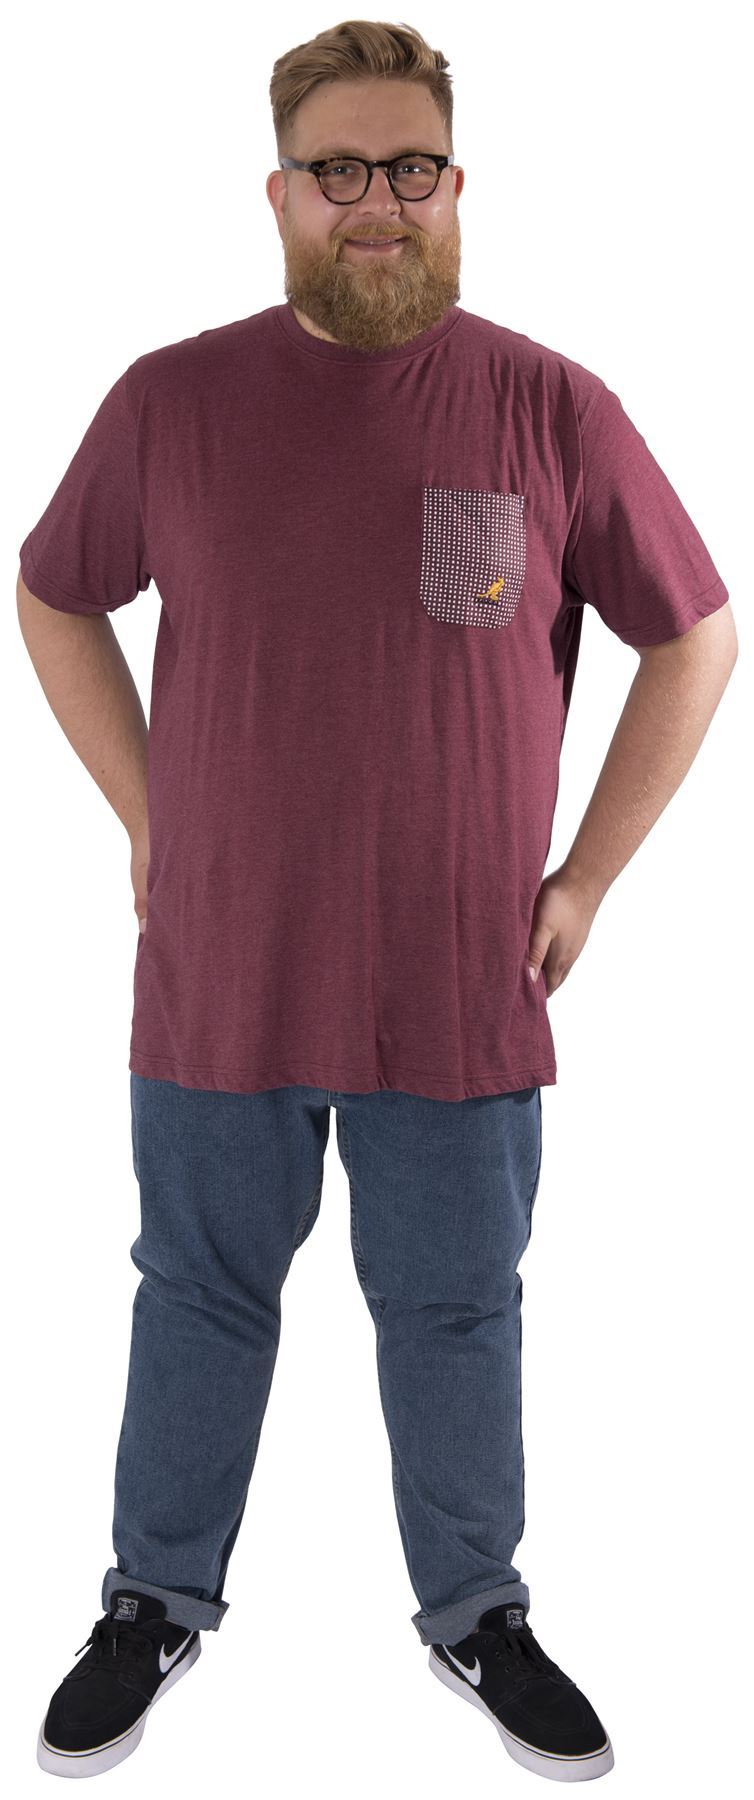 Kangol plus size mens casual marl t shirt short sleeve tee for Plus size men shirts